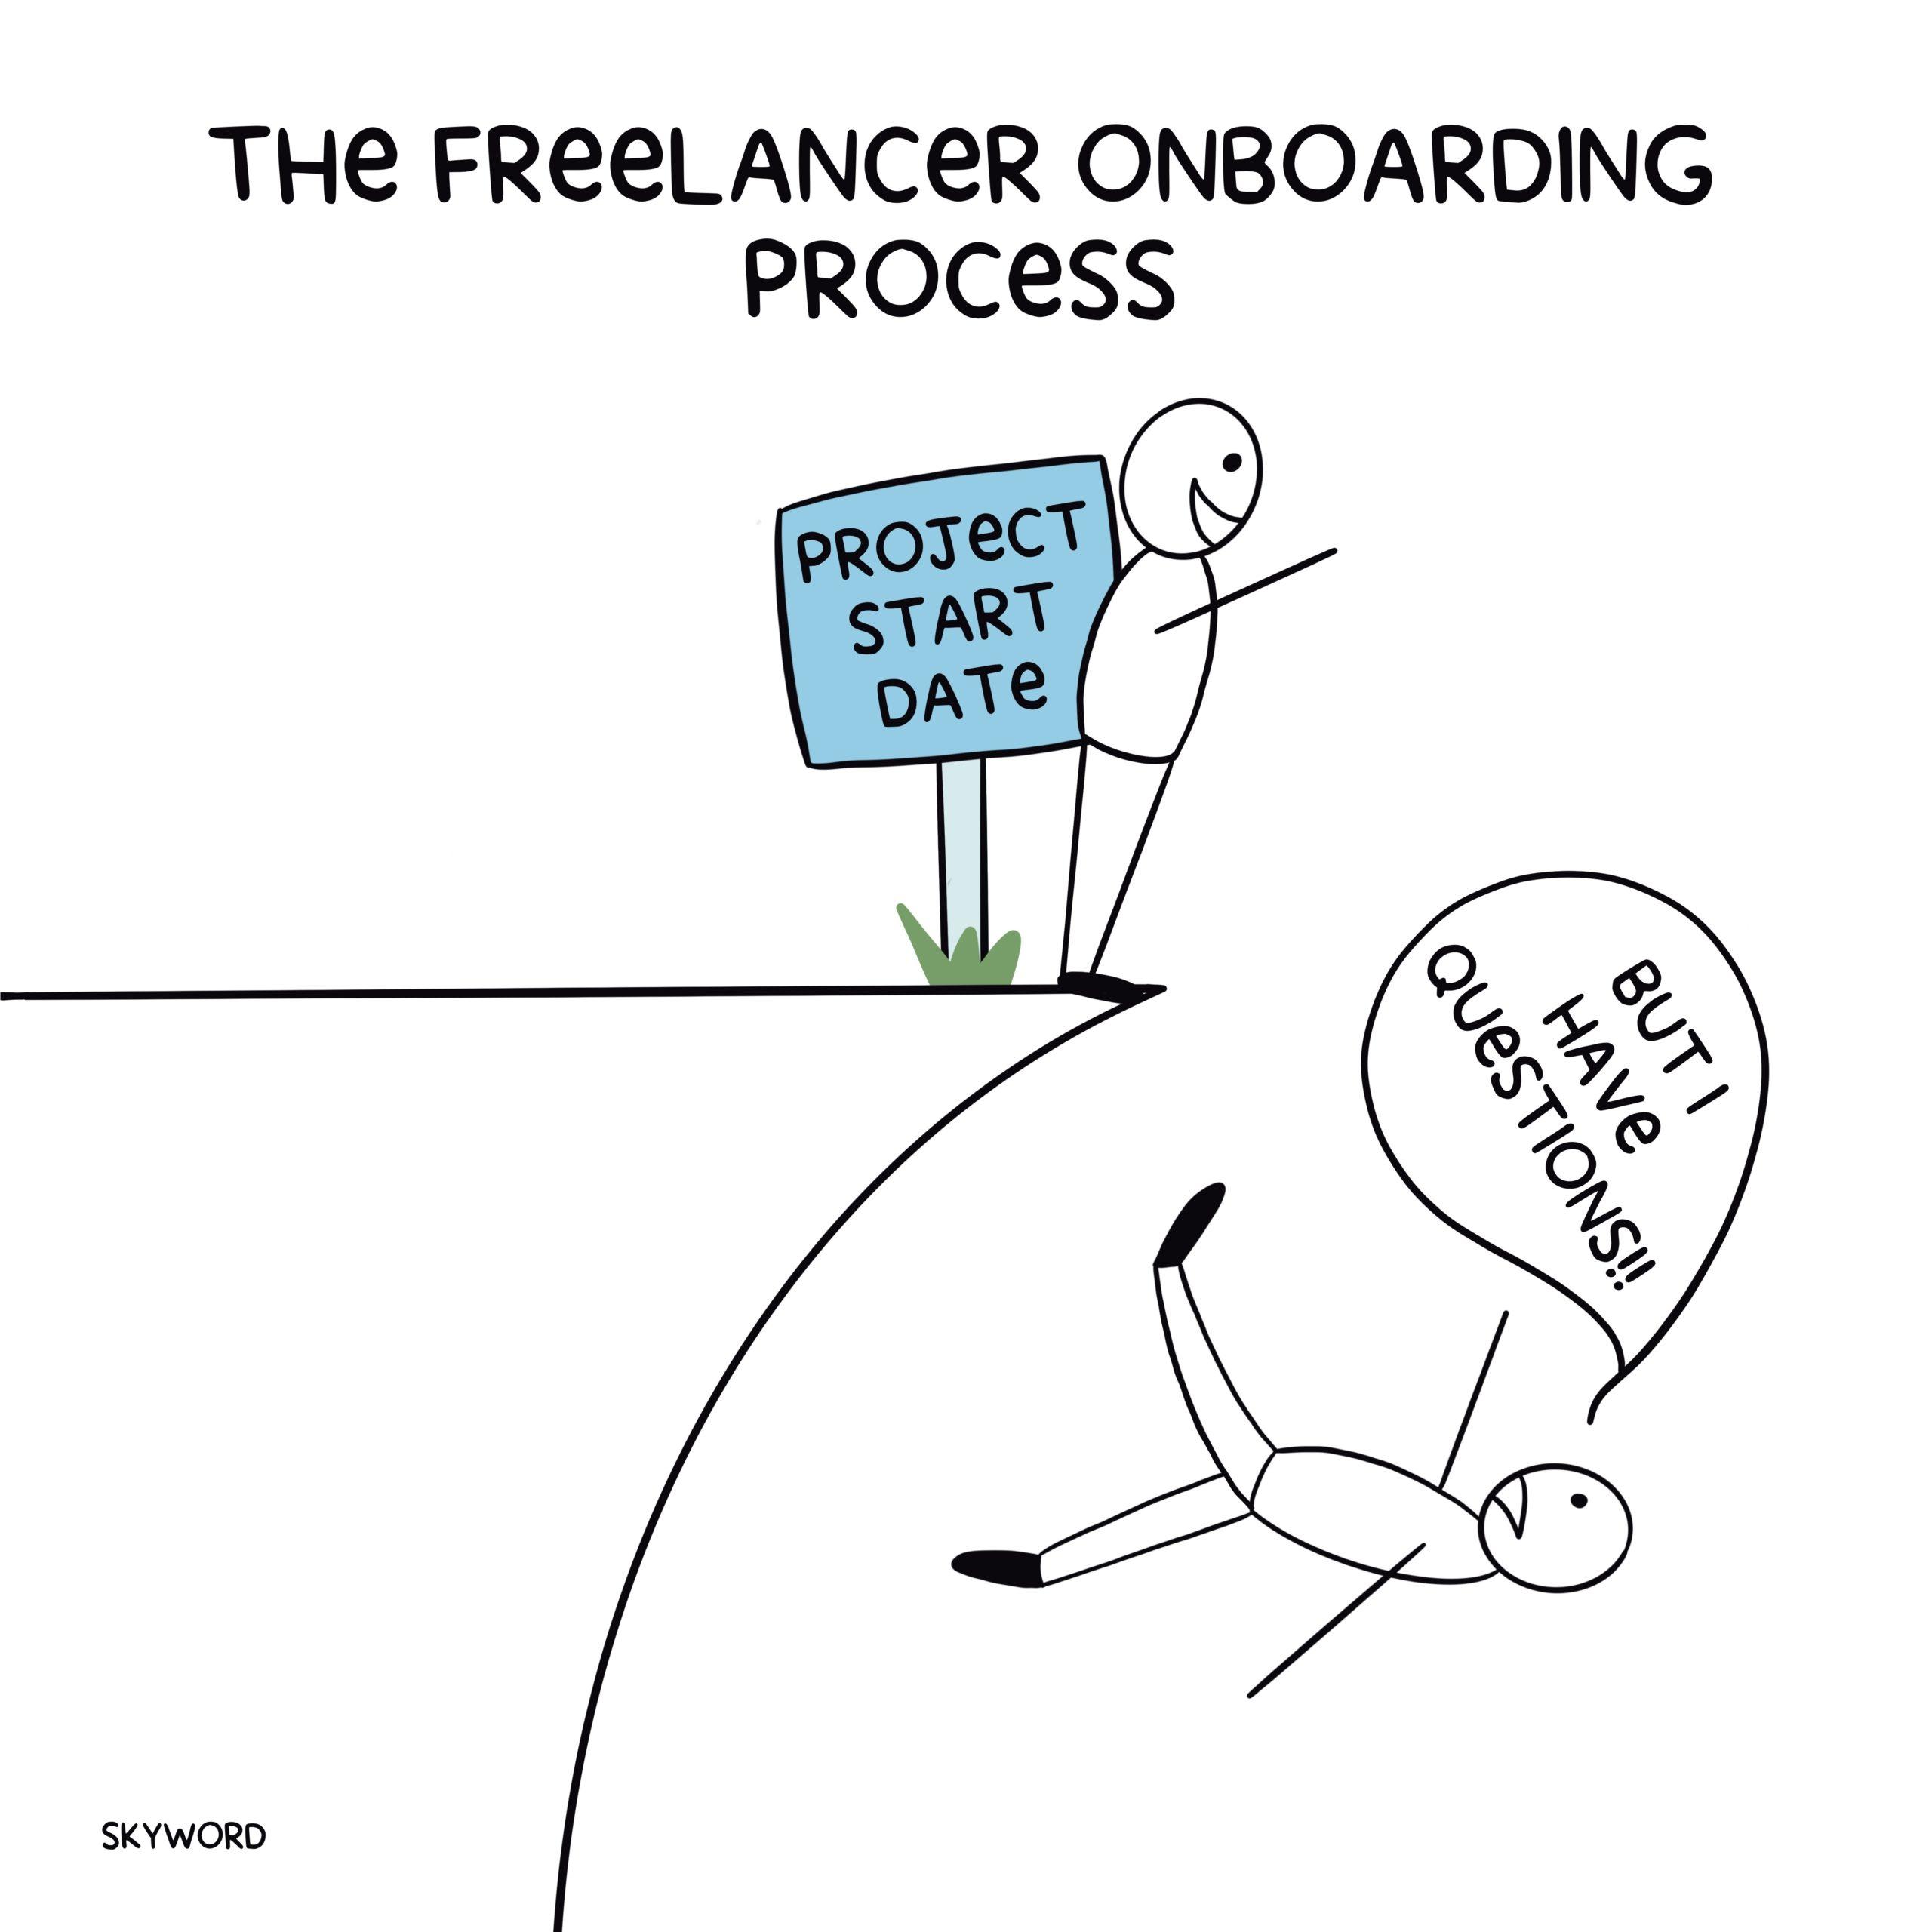 freelancer onboarding involves a learning curve